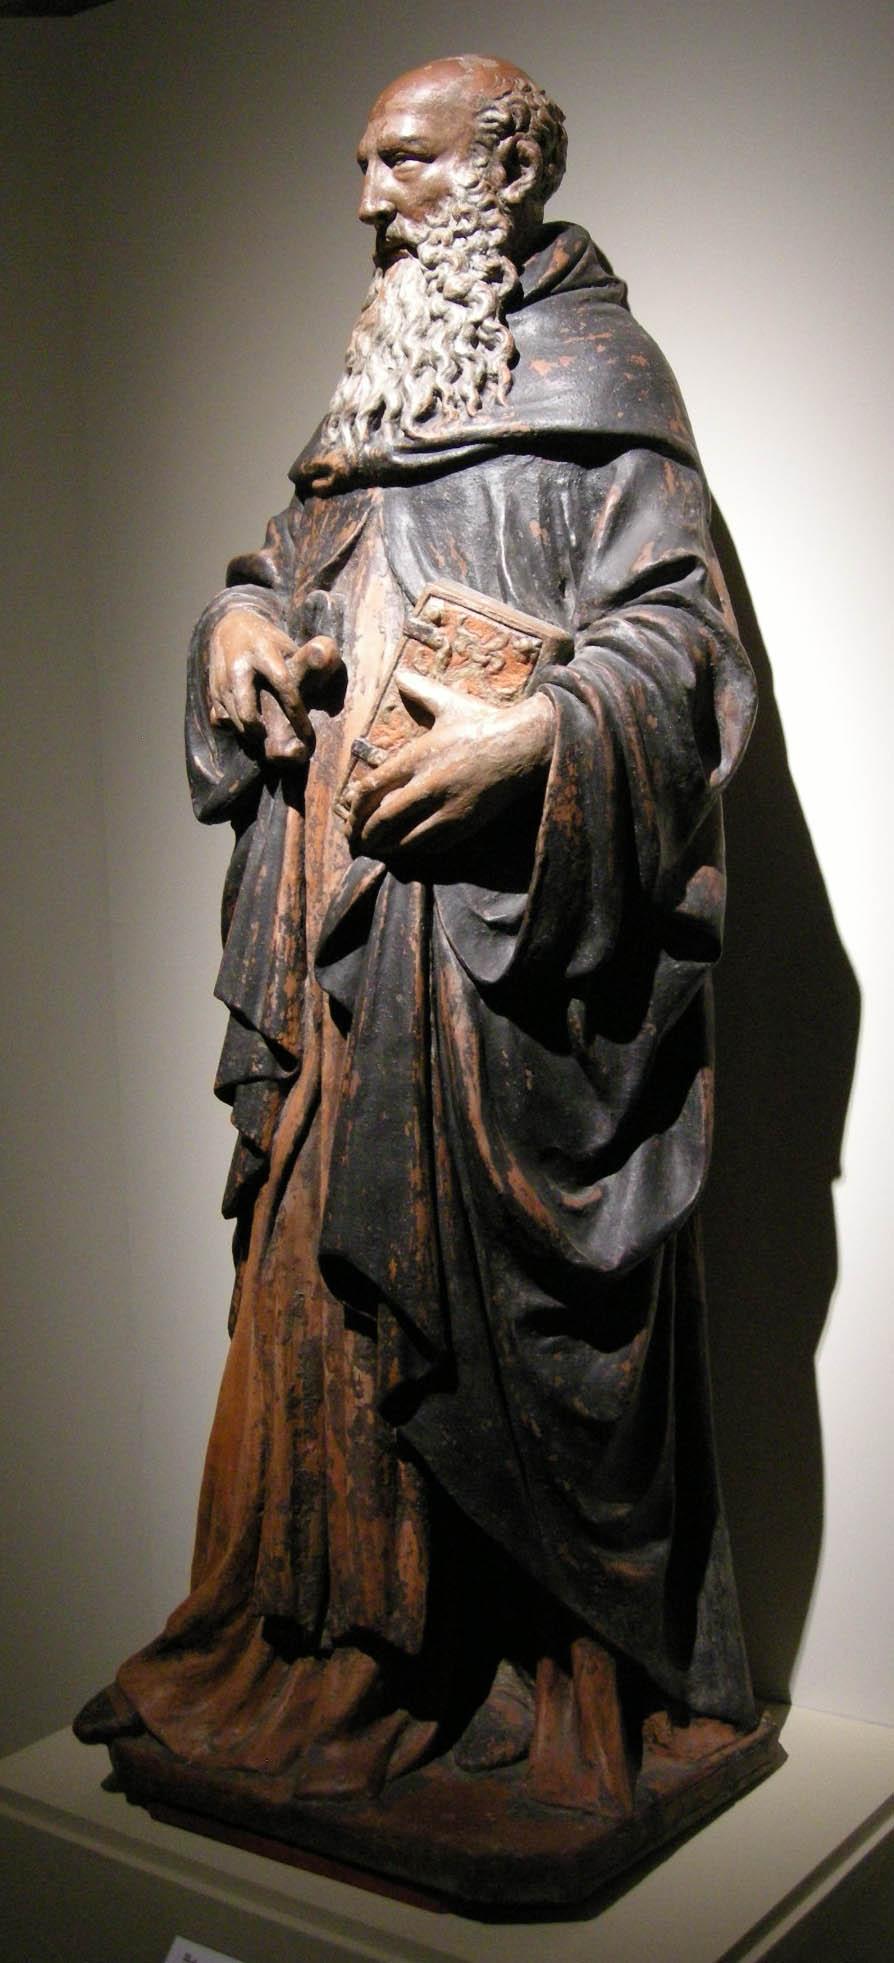 Scuola ecclesia mater sant antonio abate meditiamo dai for Arredo bimbo sant antonio abate